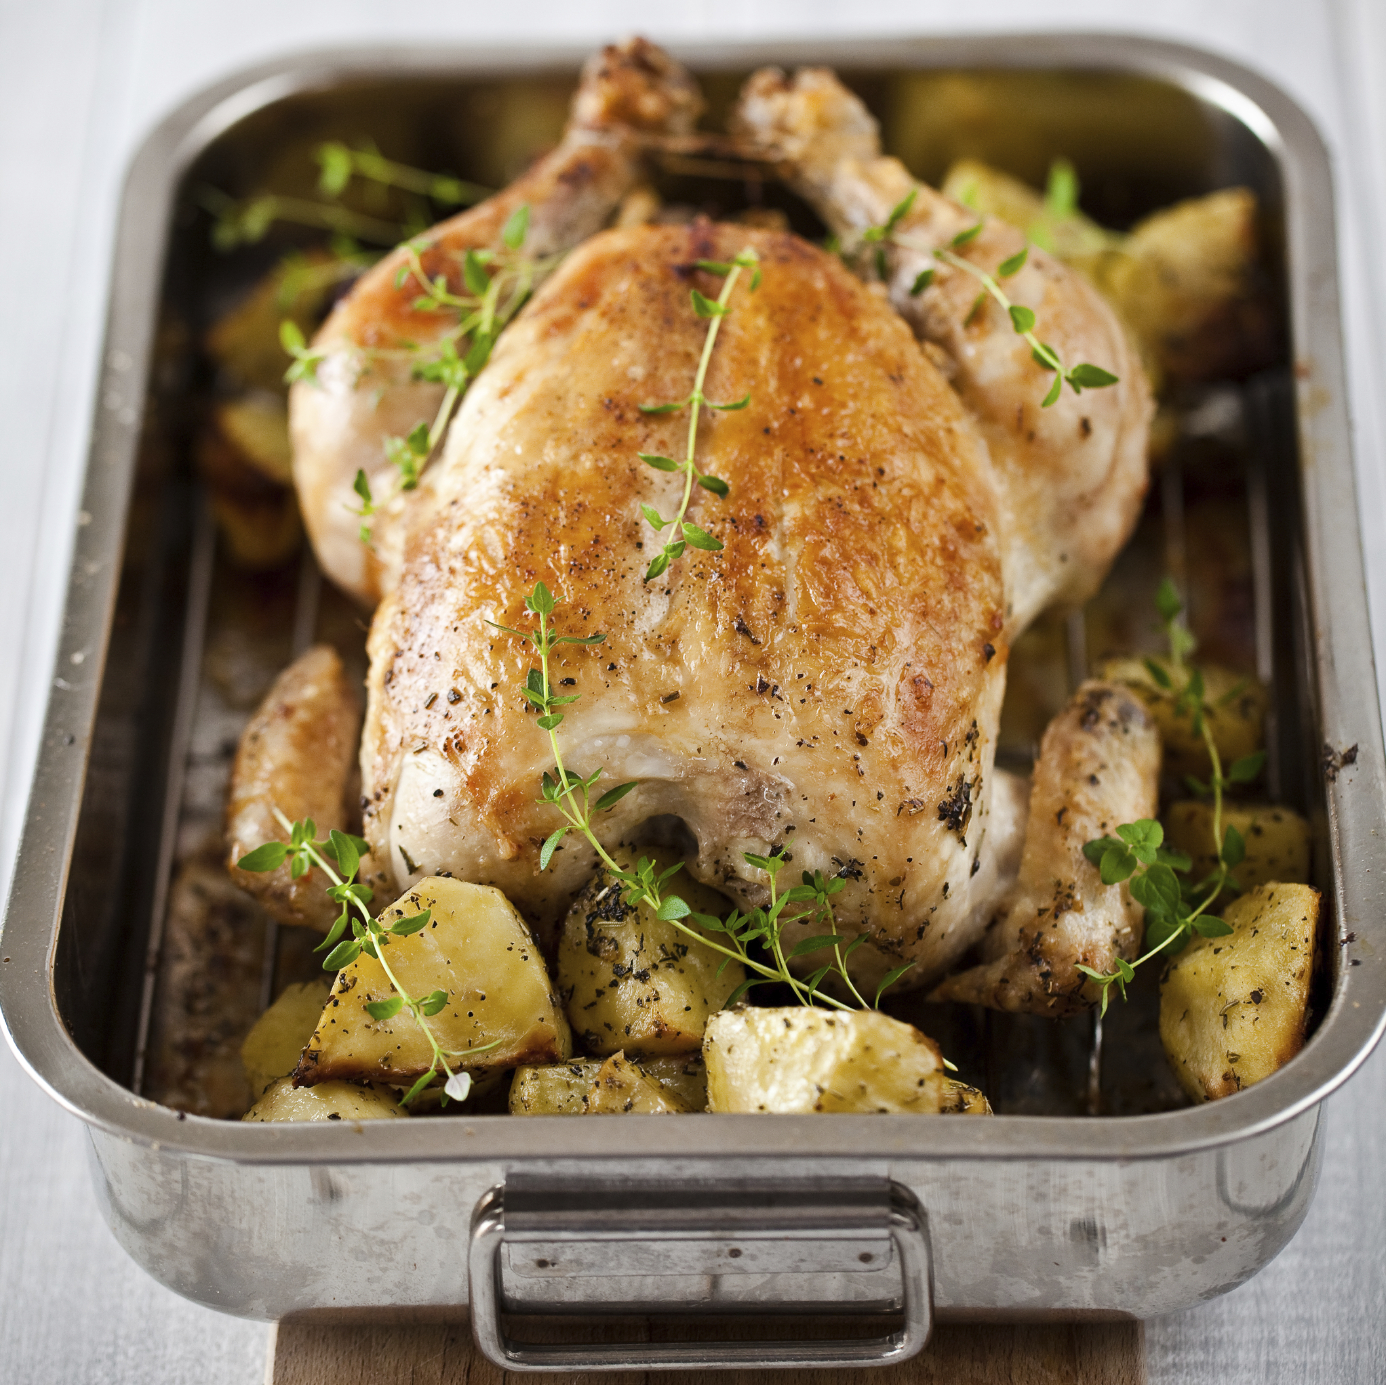 Pollo al horno acompañado de patatas fritas